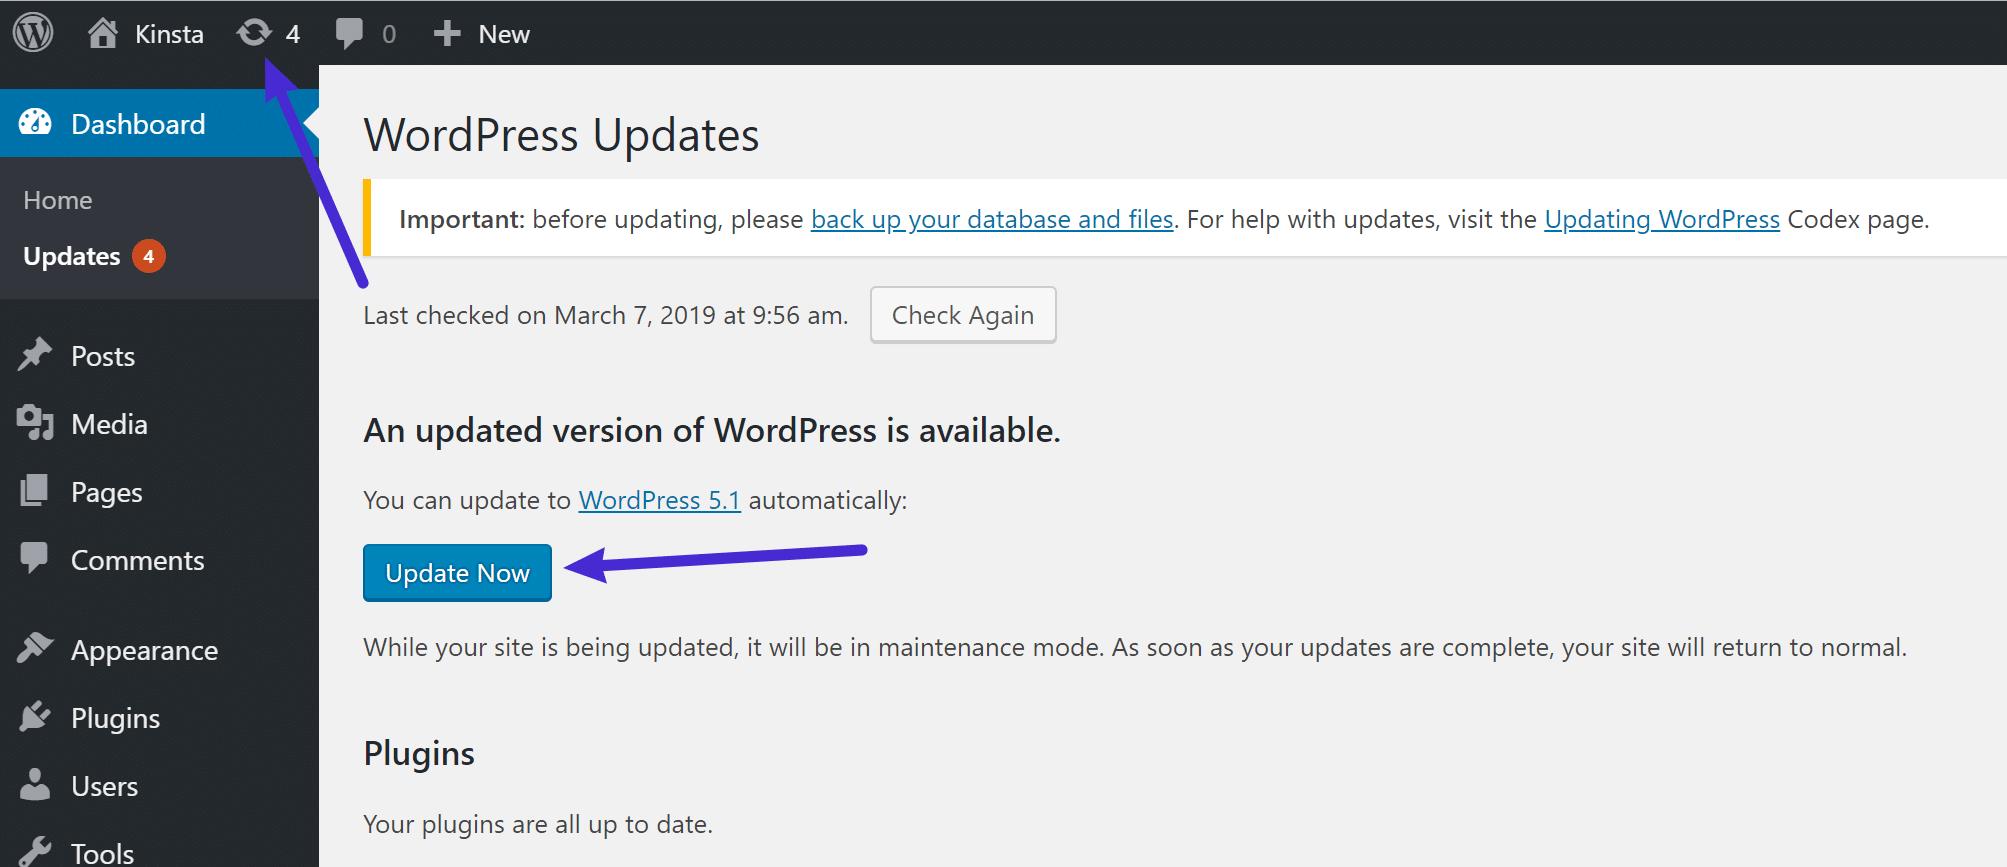 How to update to WordPress 5.1